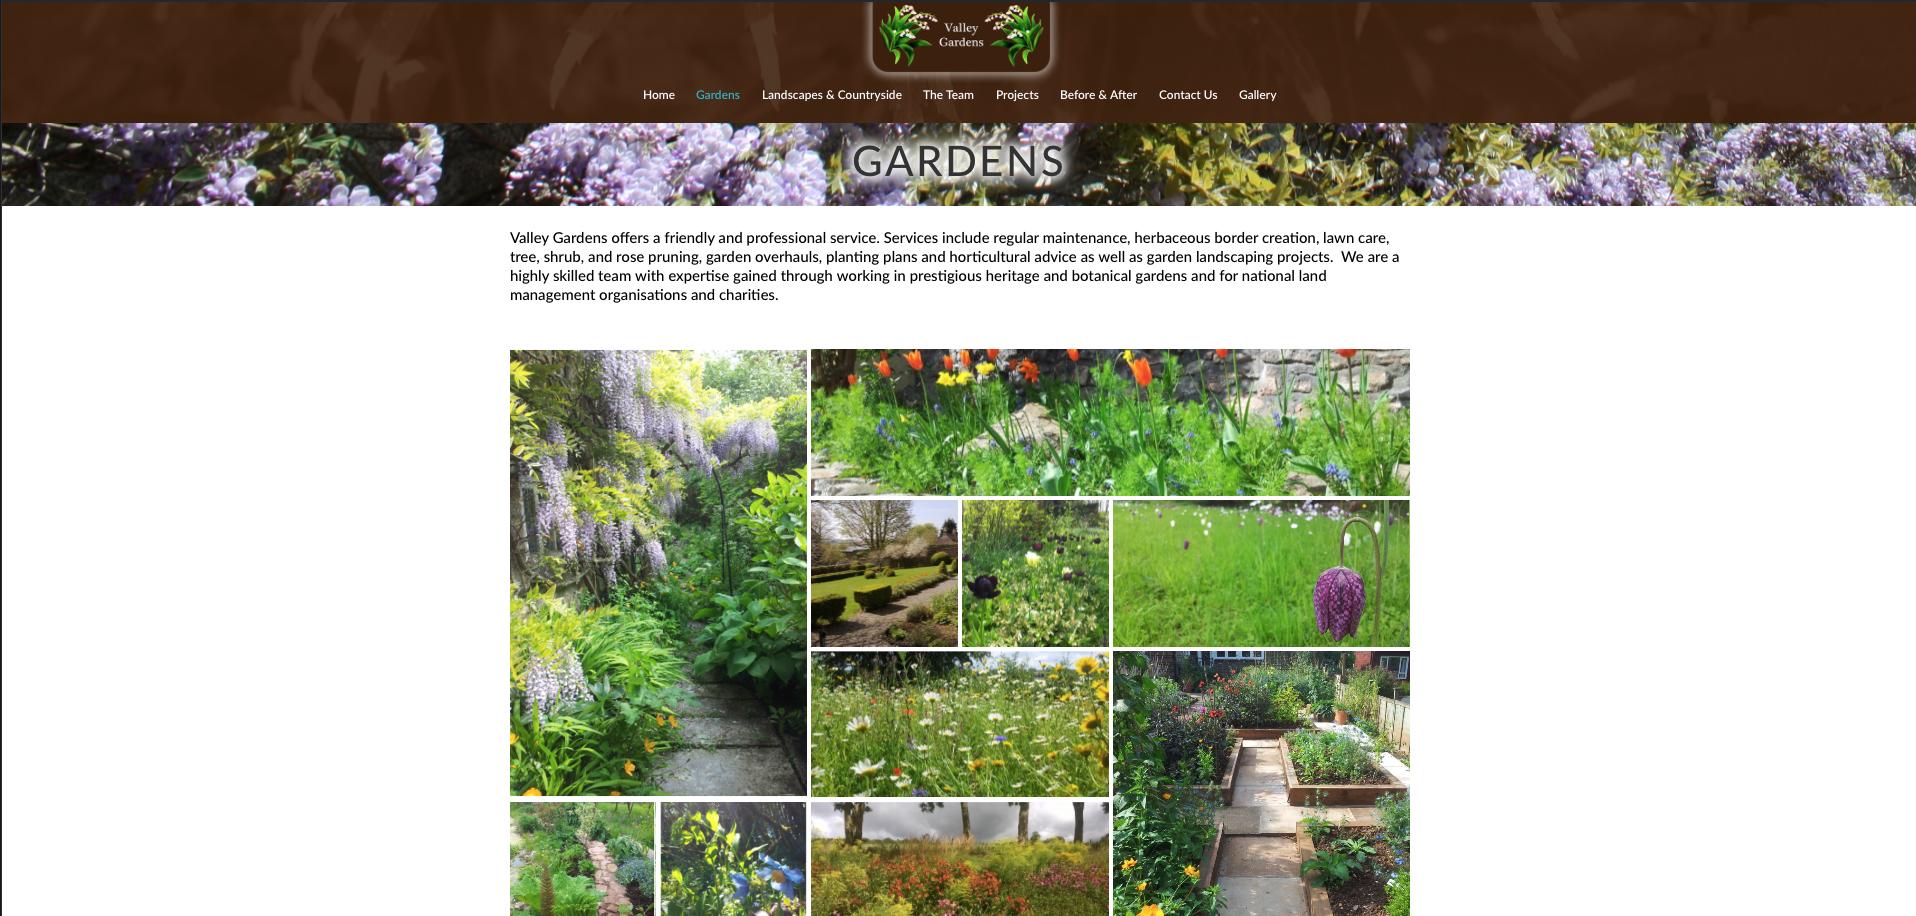 Valley Gardens Gardens page